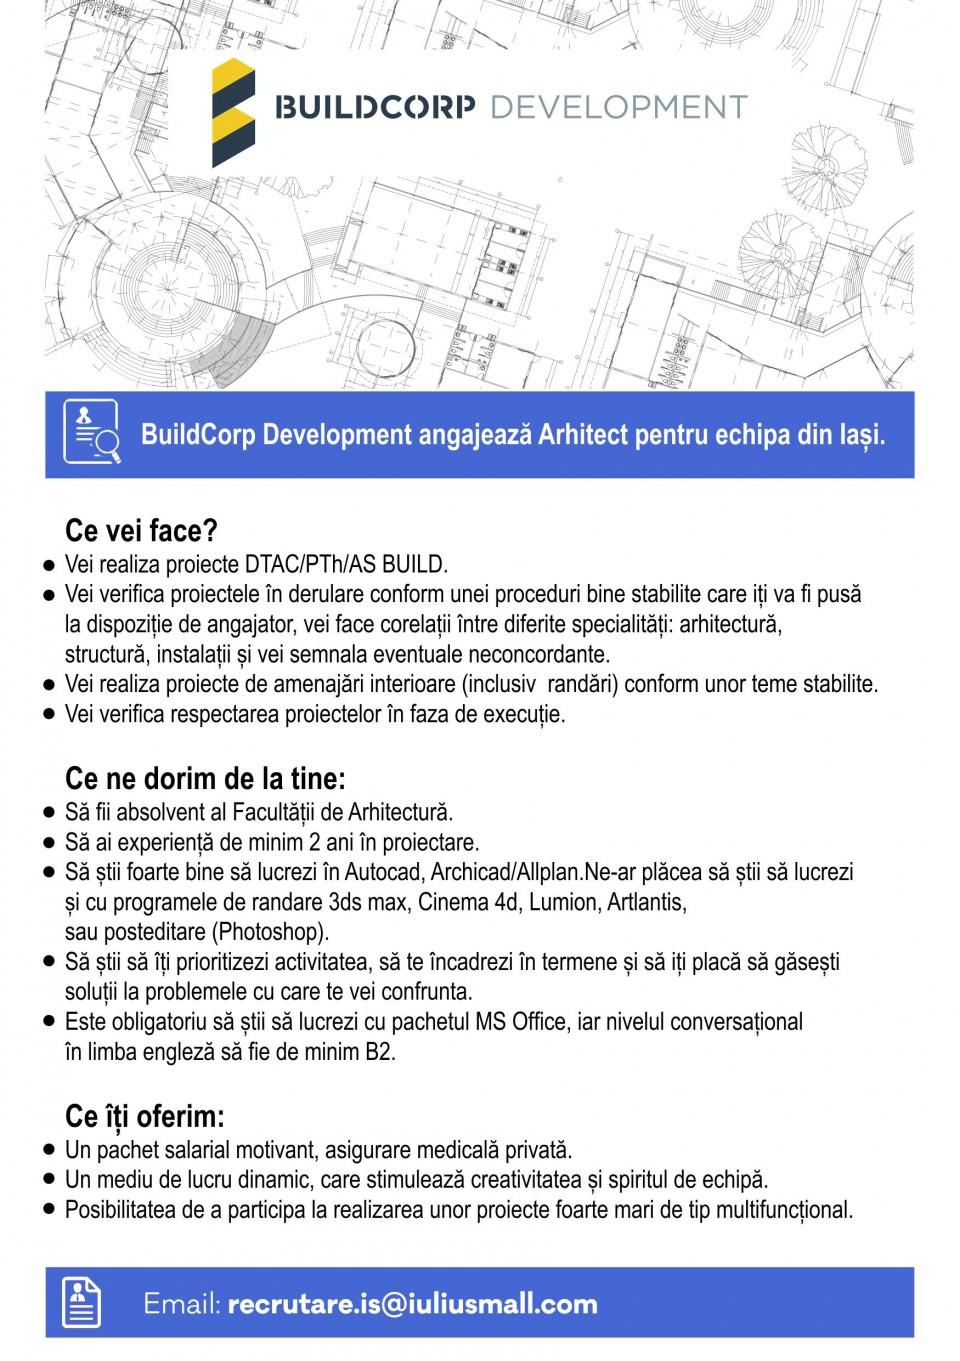 Iasi Build Corp Development Development Arhitect